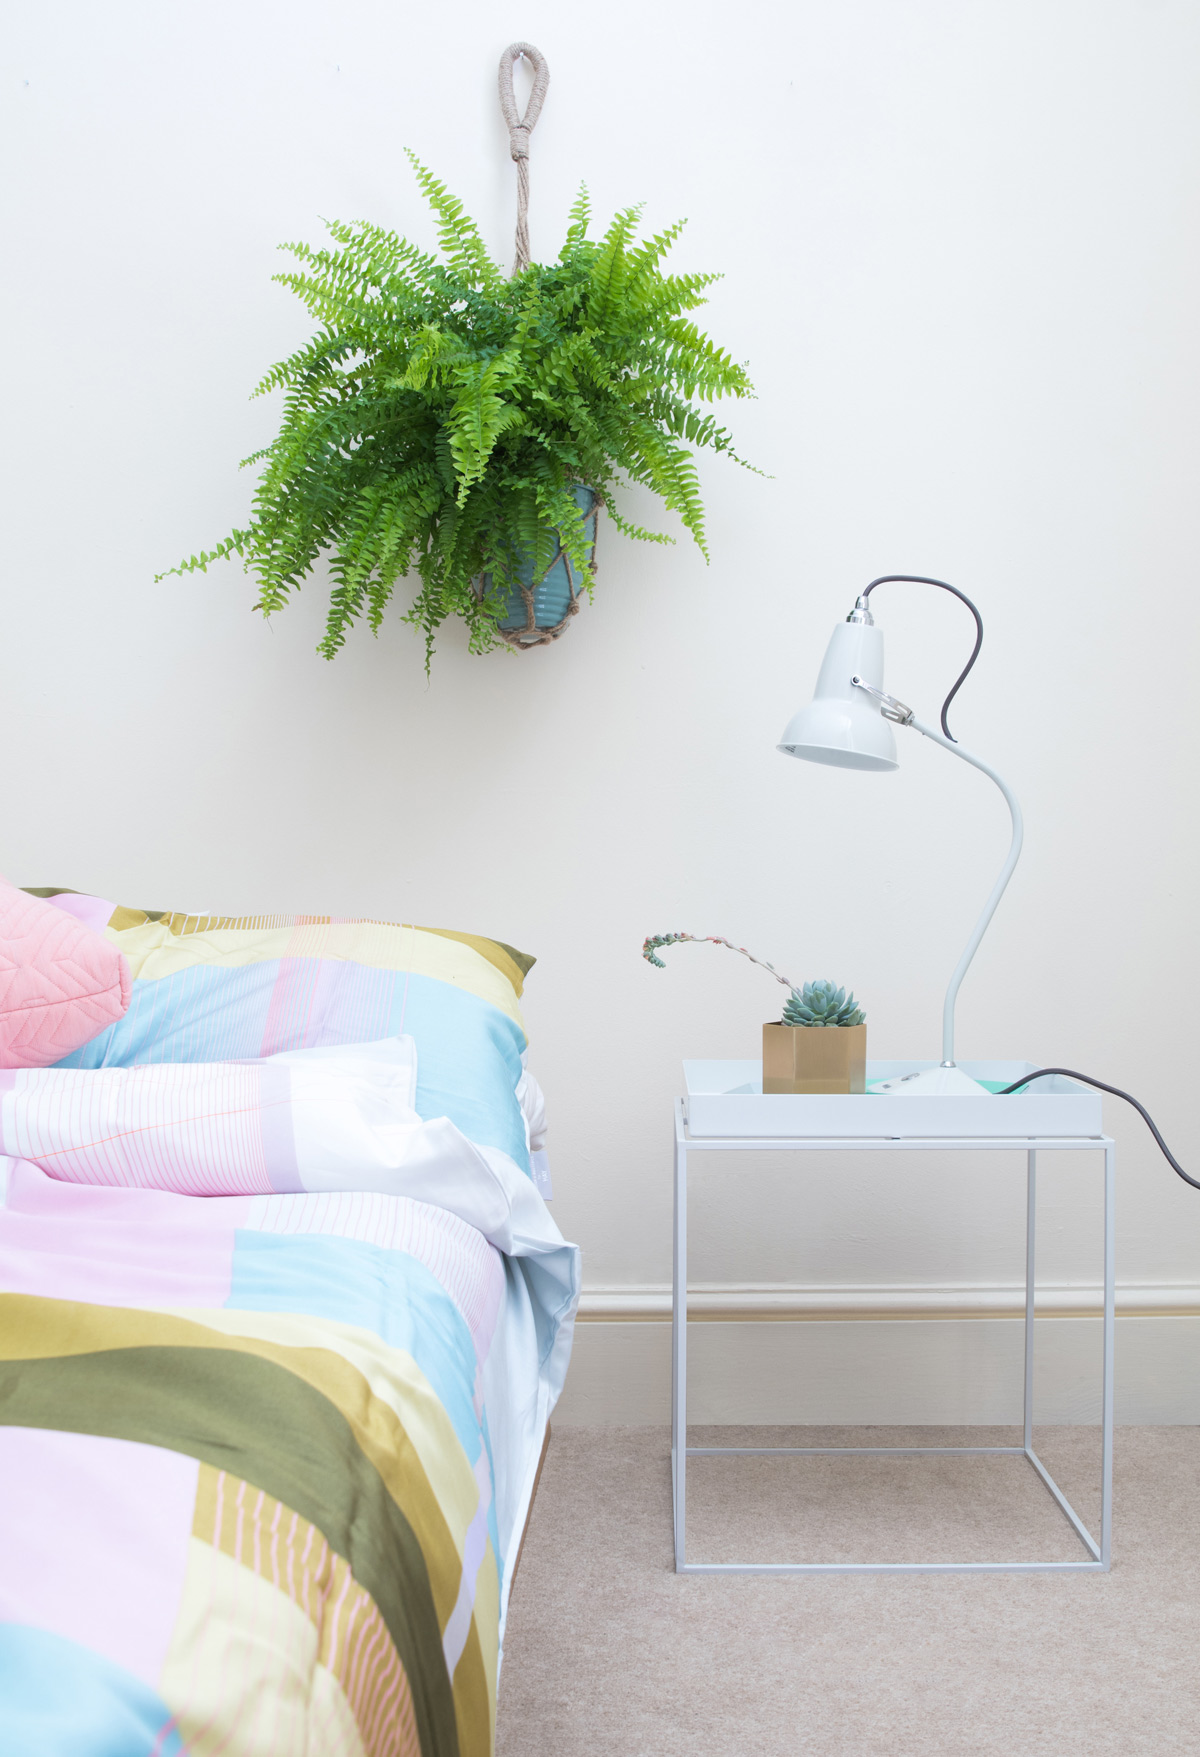 Nestcouk-Top-Design-Picks-Hay-Tray-Table.jpg